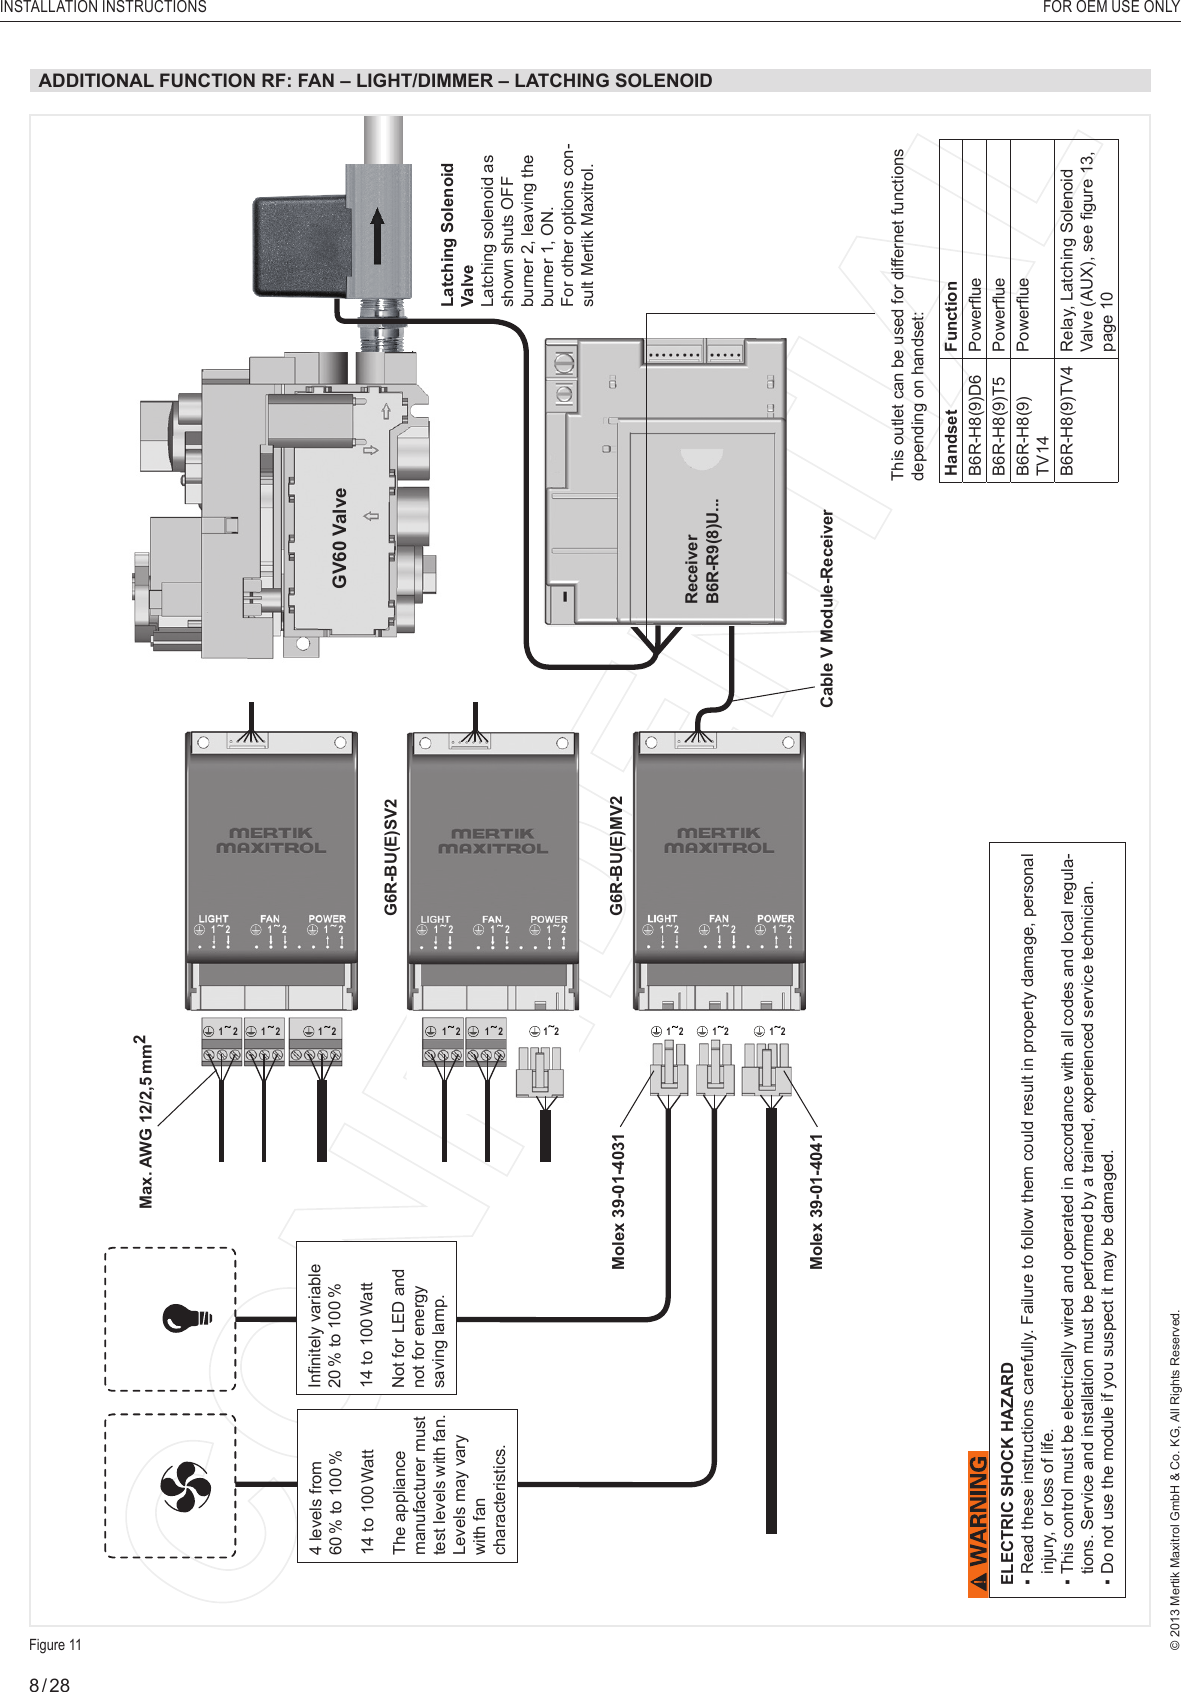 orangerx v 1.2 module manual